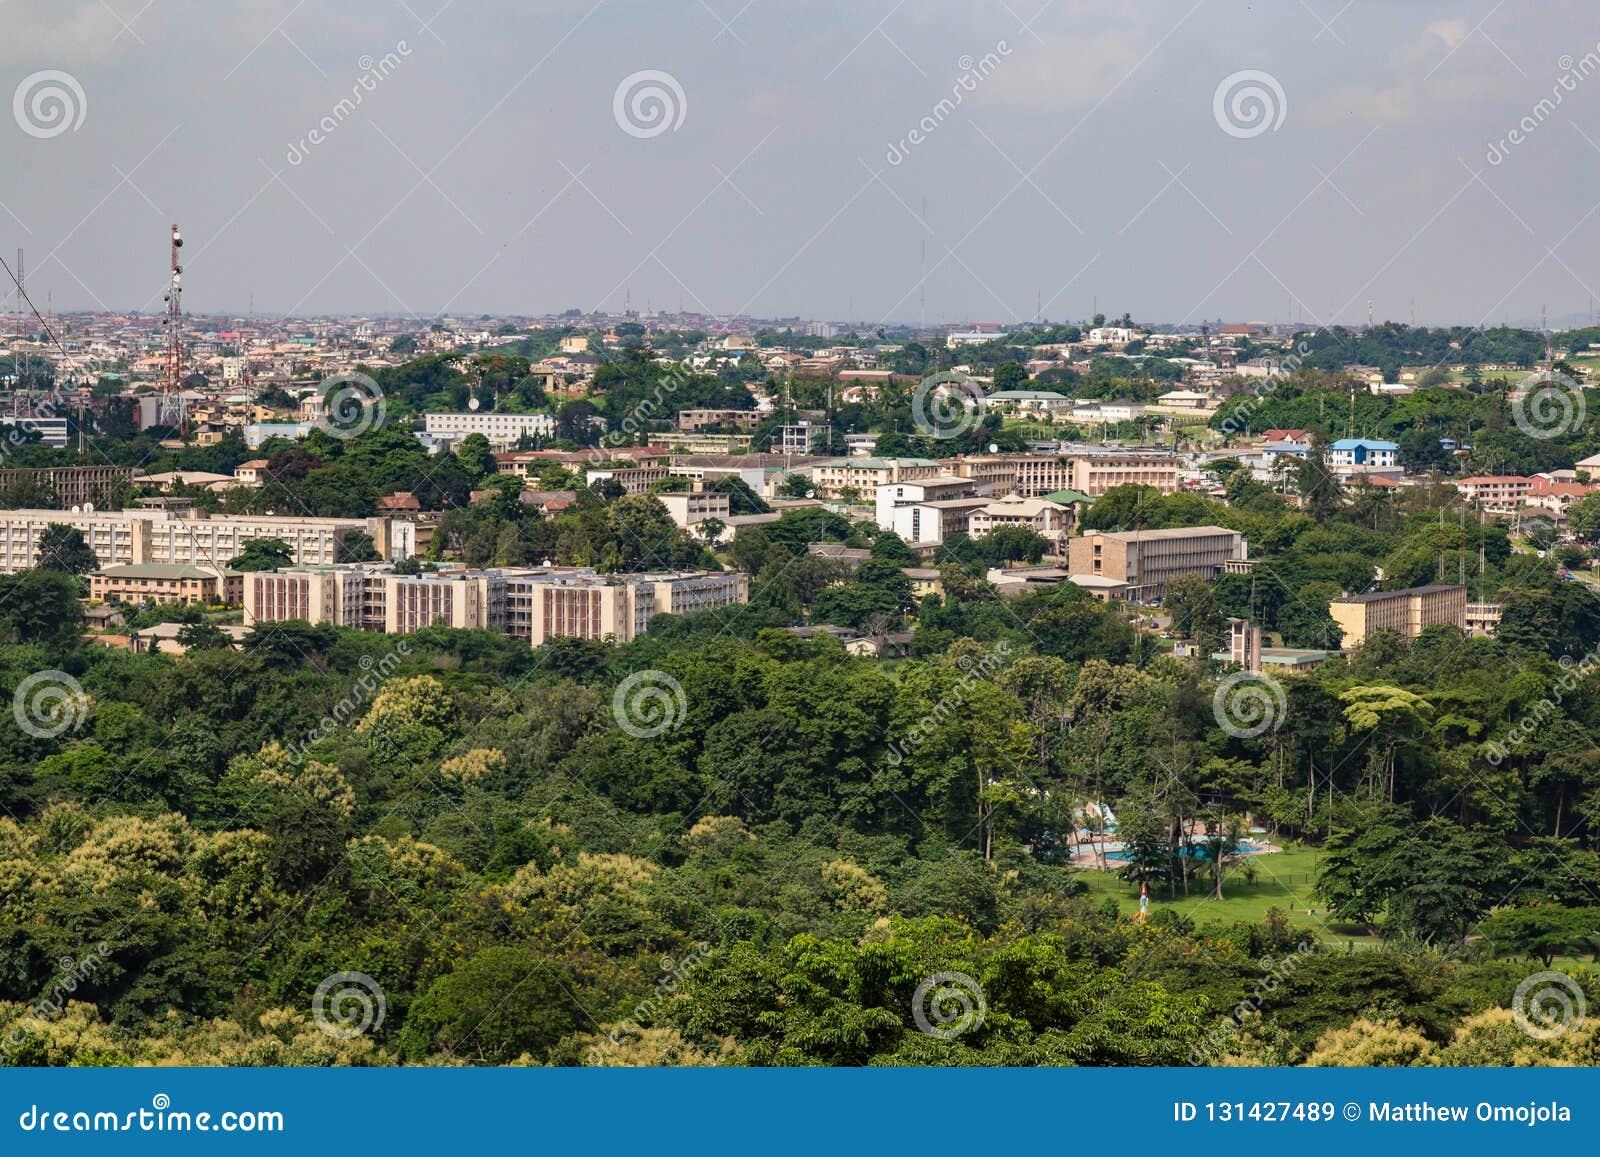 Aerial View Of Oyo State Government Secretariat Ibadan